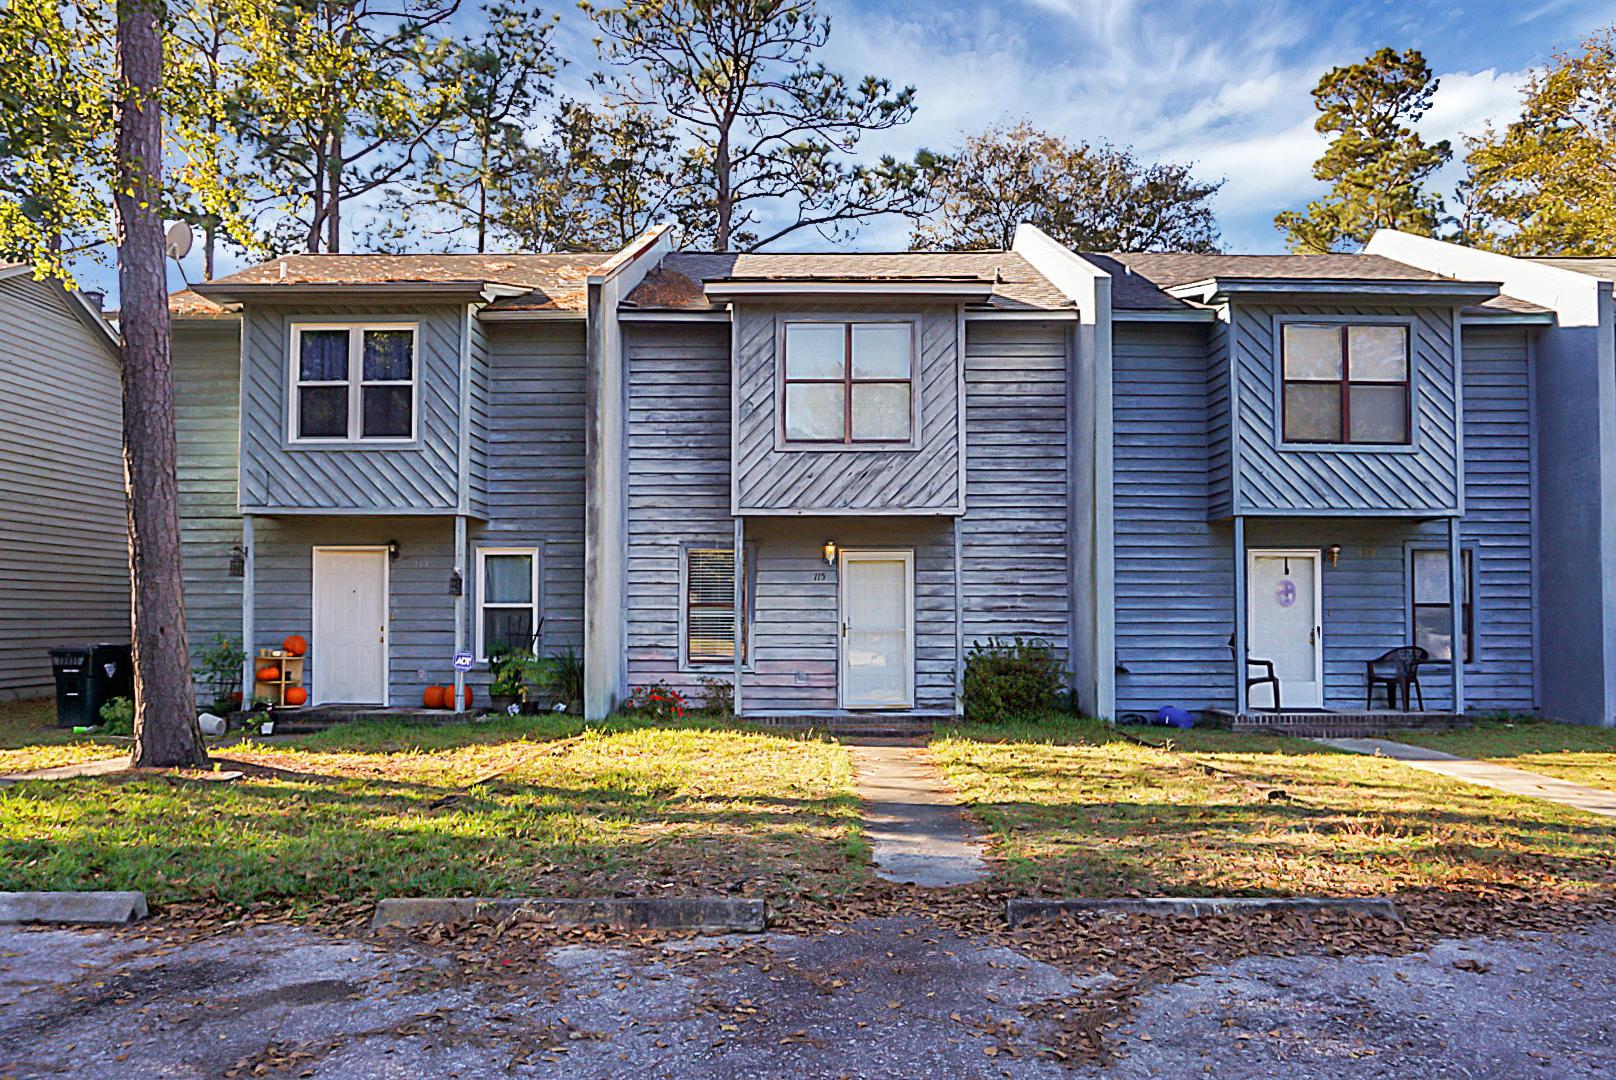 115 N Birch Street Summerville, SC 29483